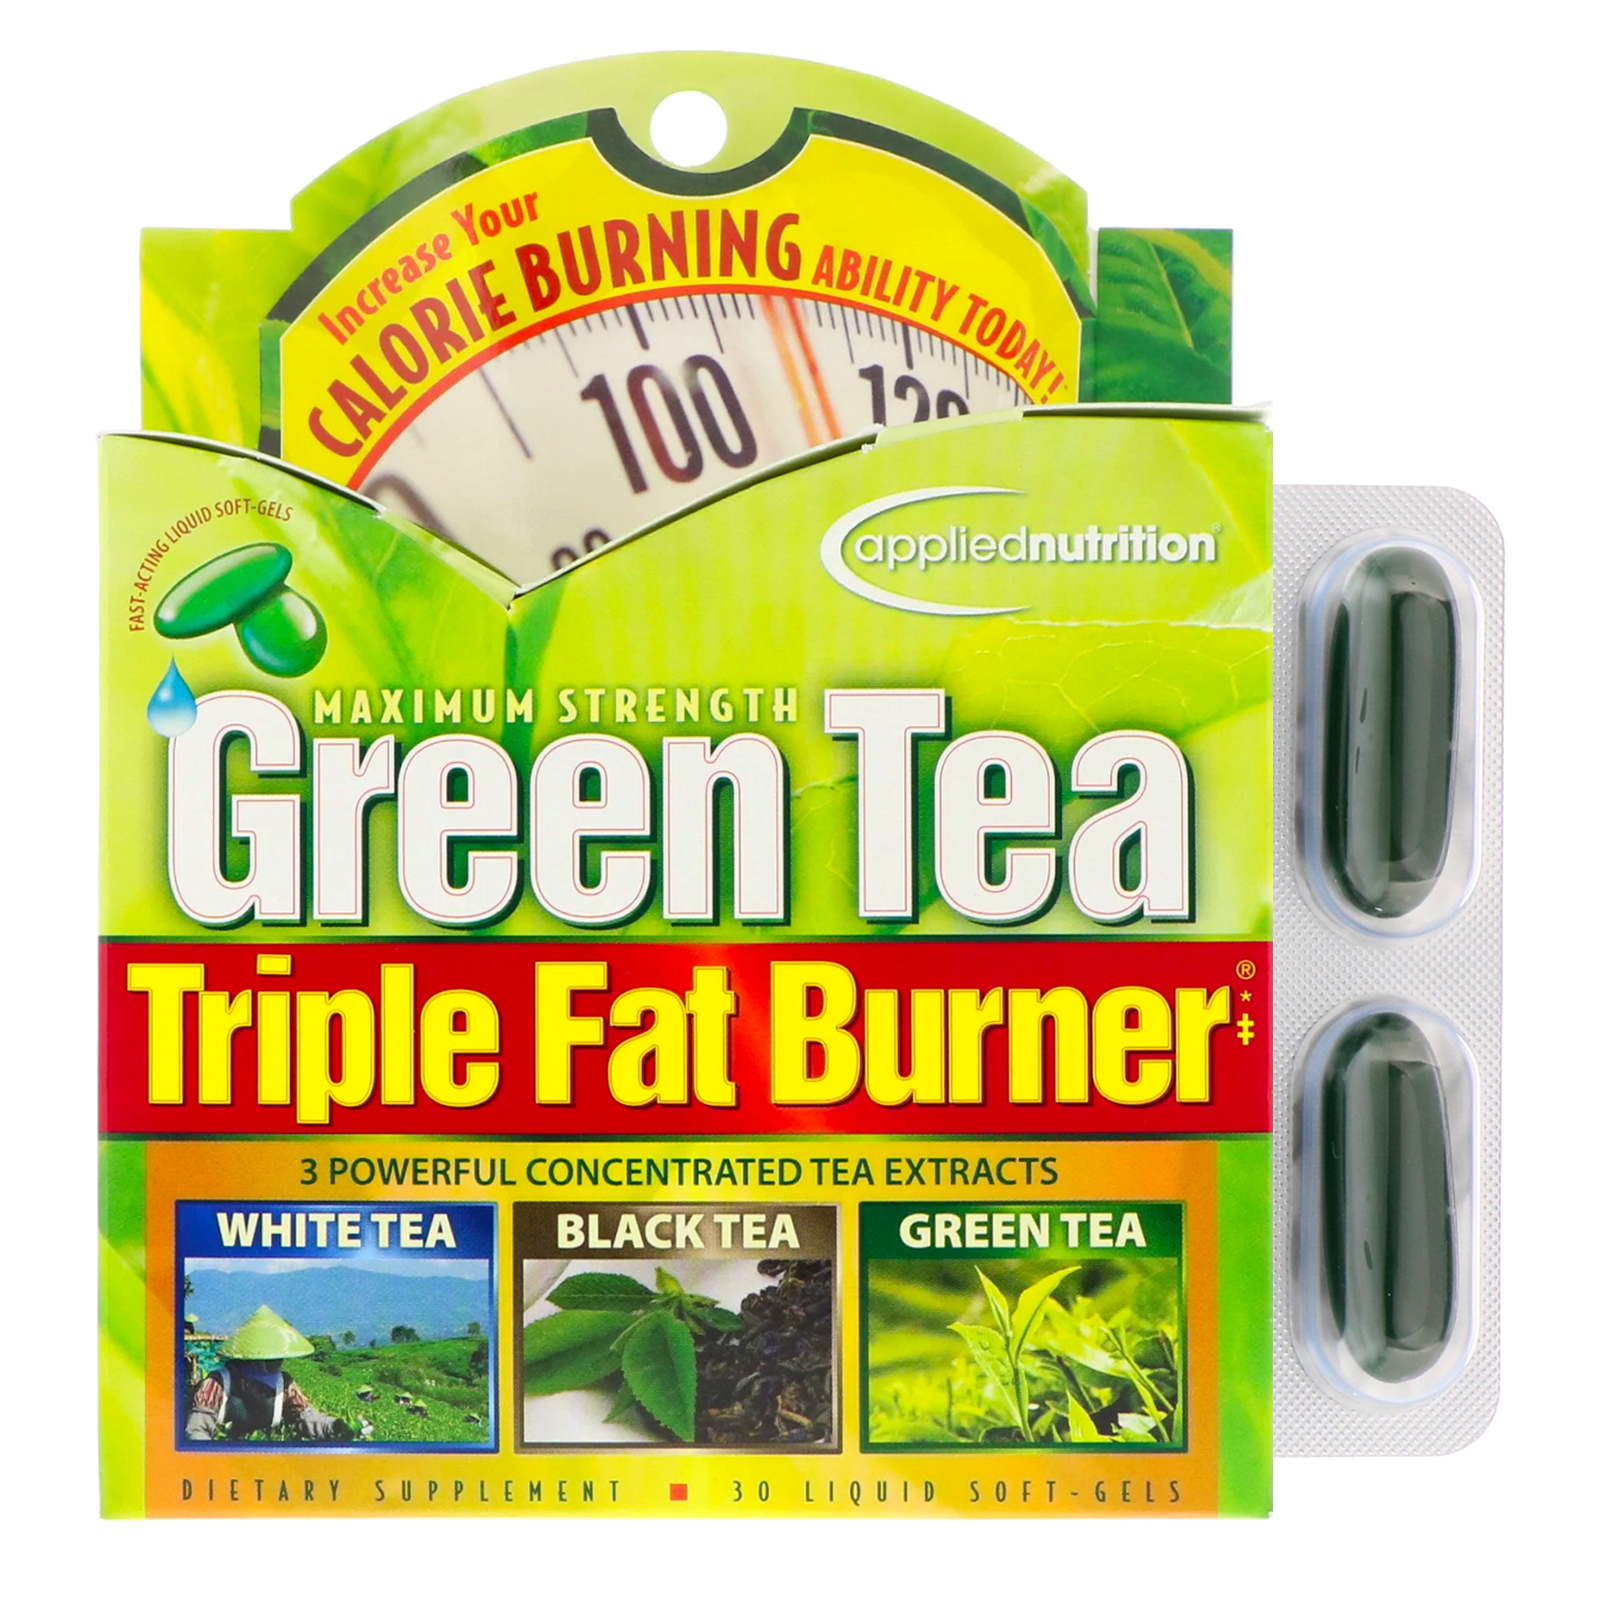 triple fat burner fit 4 life